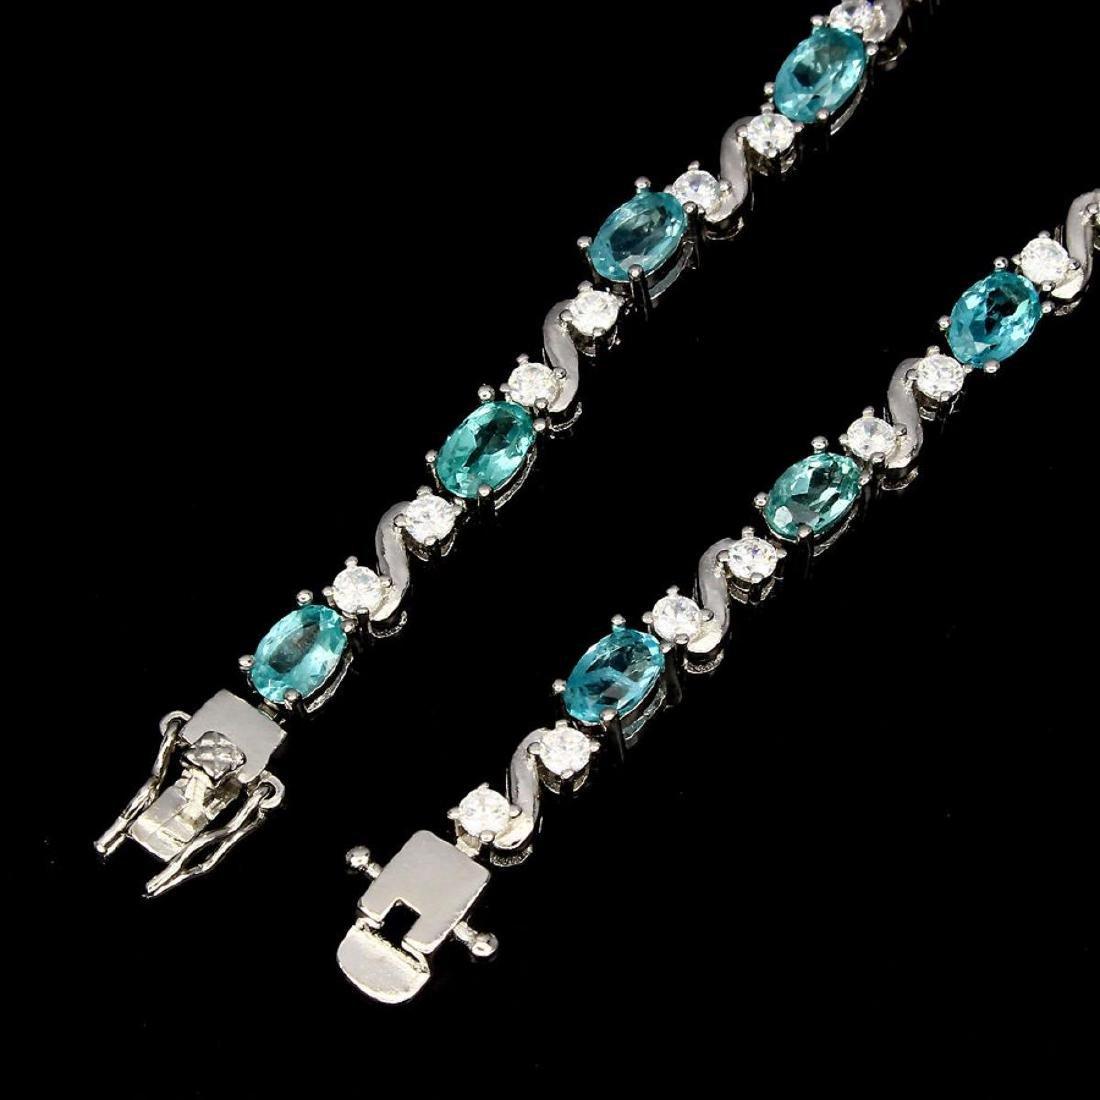 Natural Oval Neon Blue Apatite 60 Carats Bracelet - 3